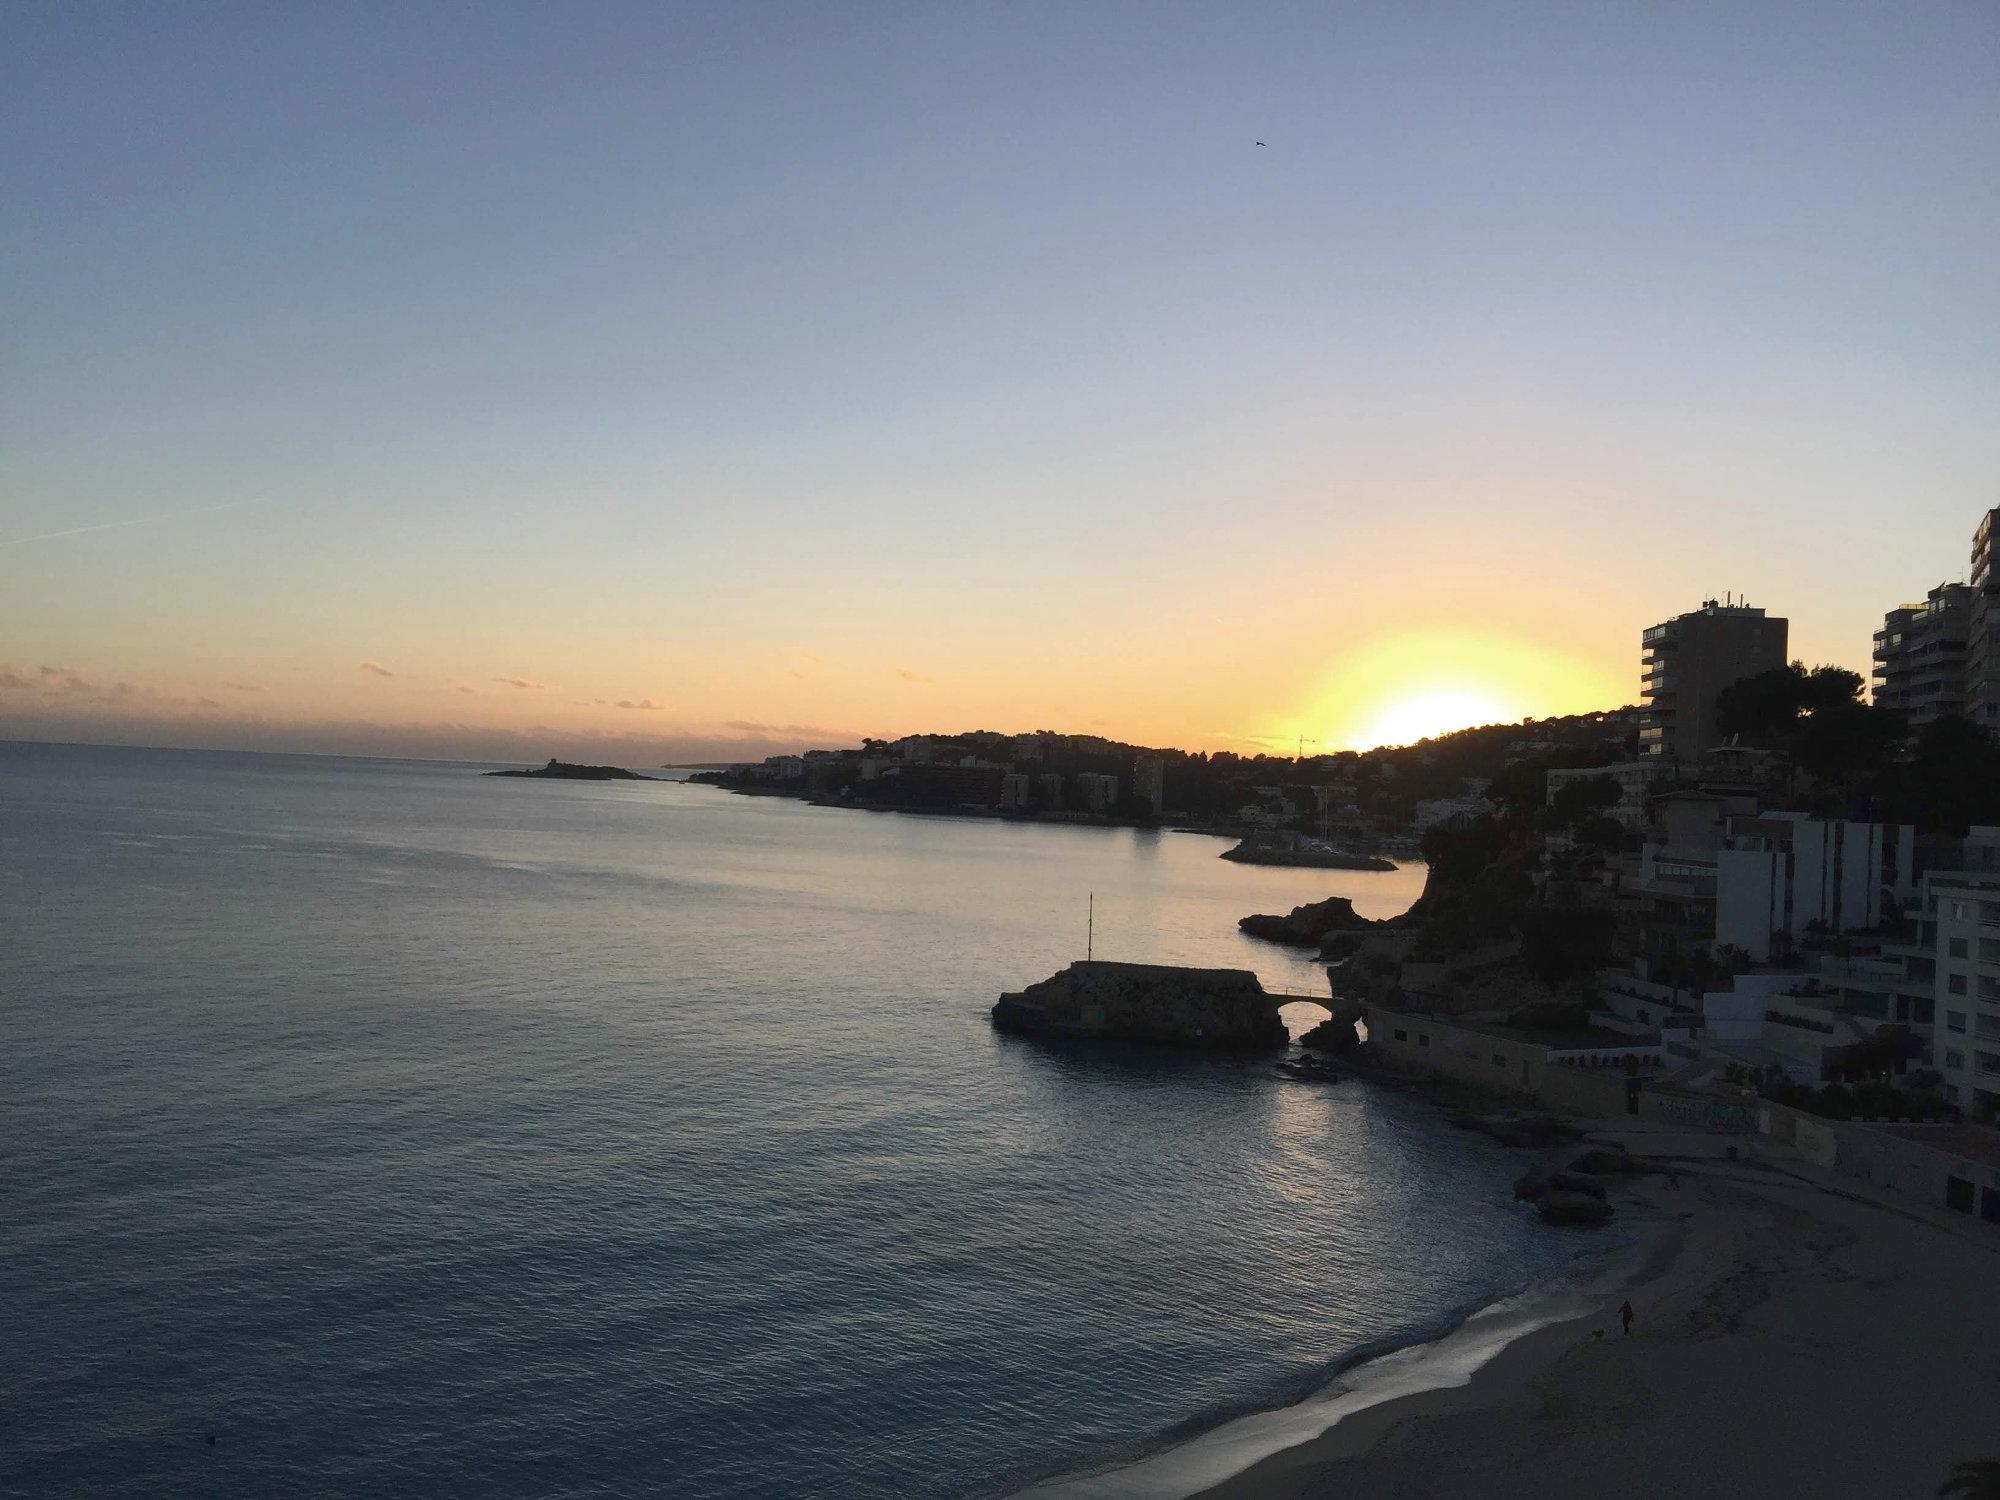 Sonnenuntergang in Strandbucht auf Mallorca